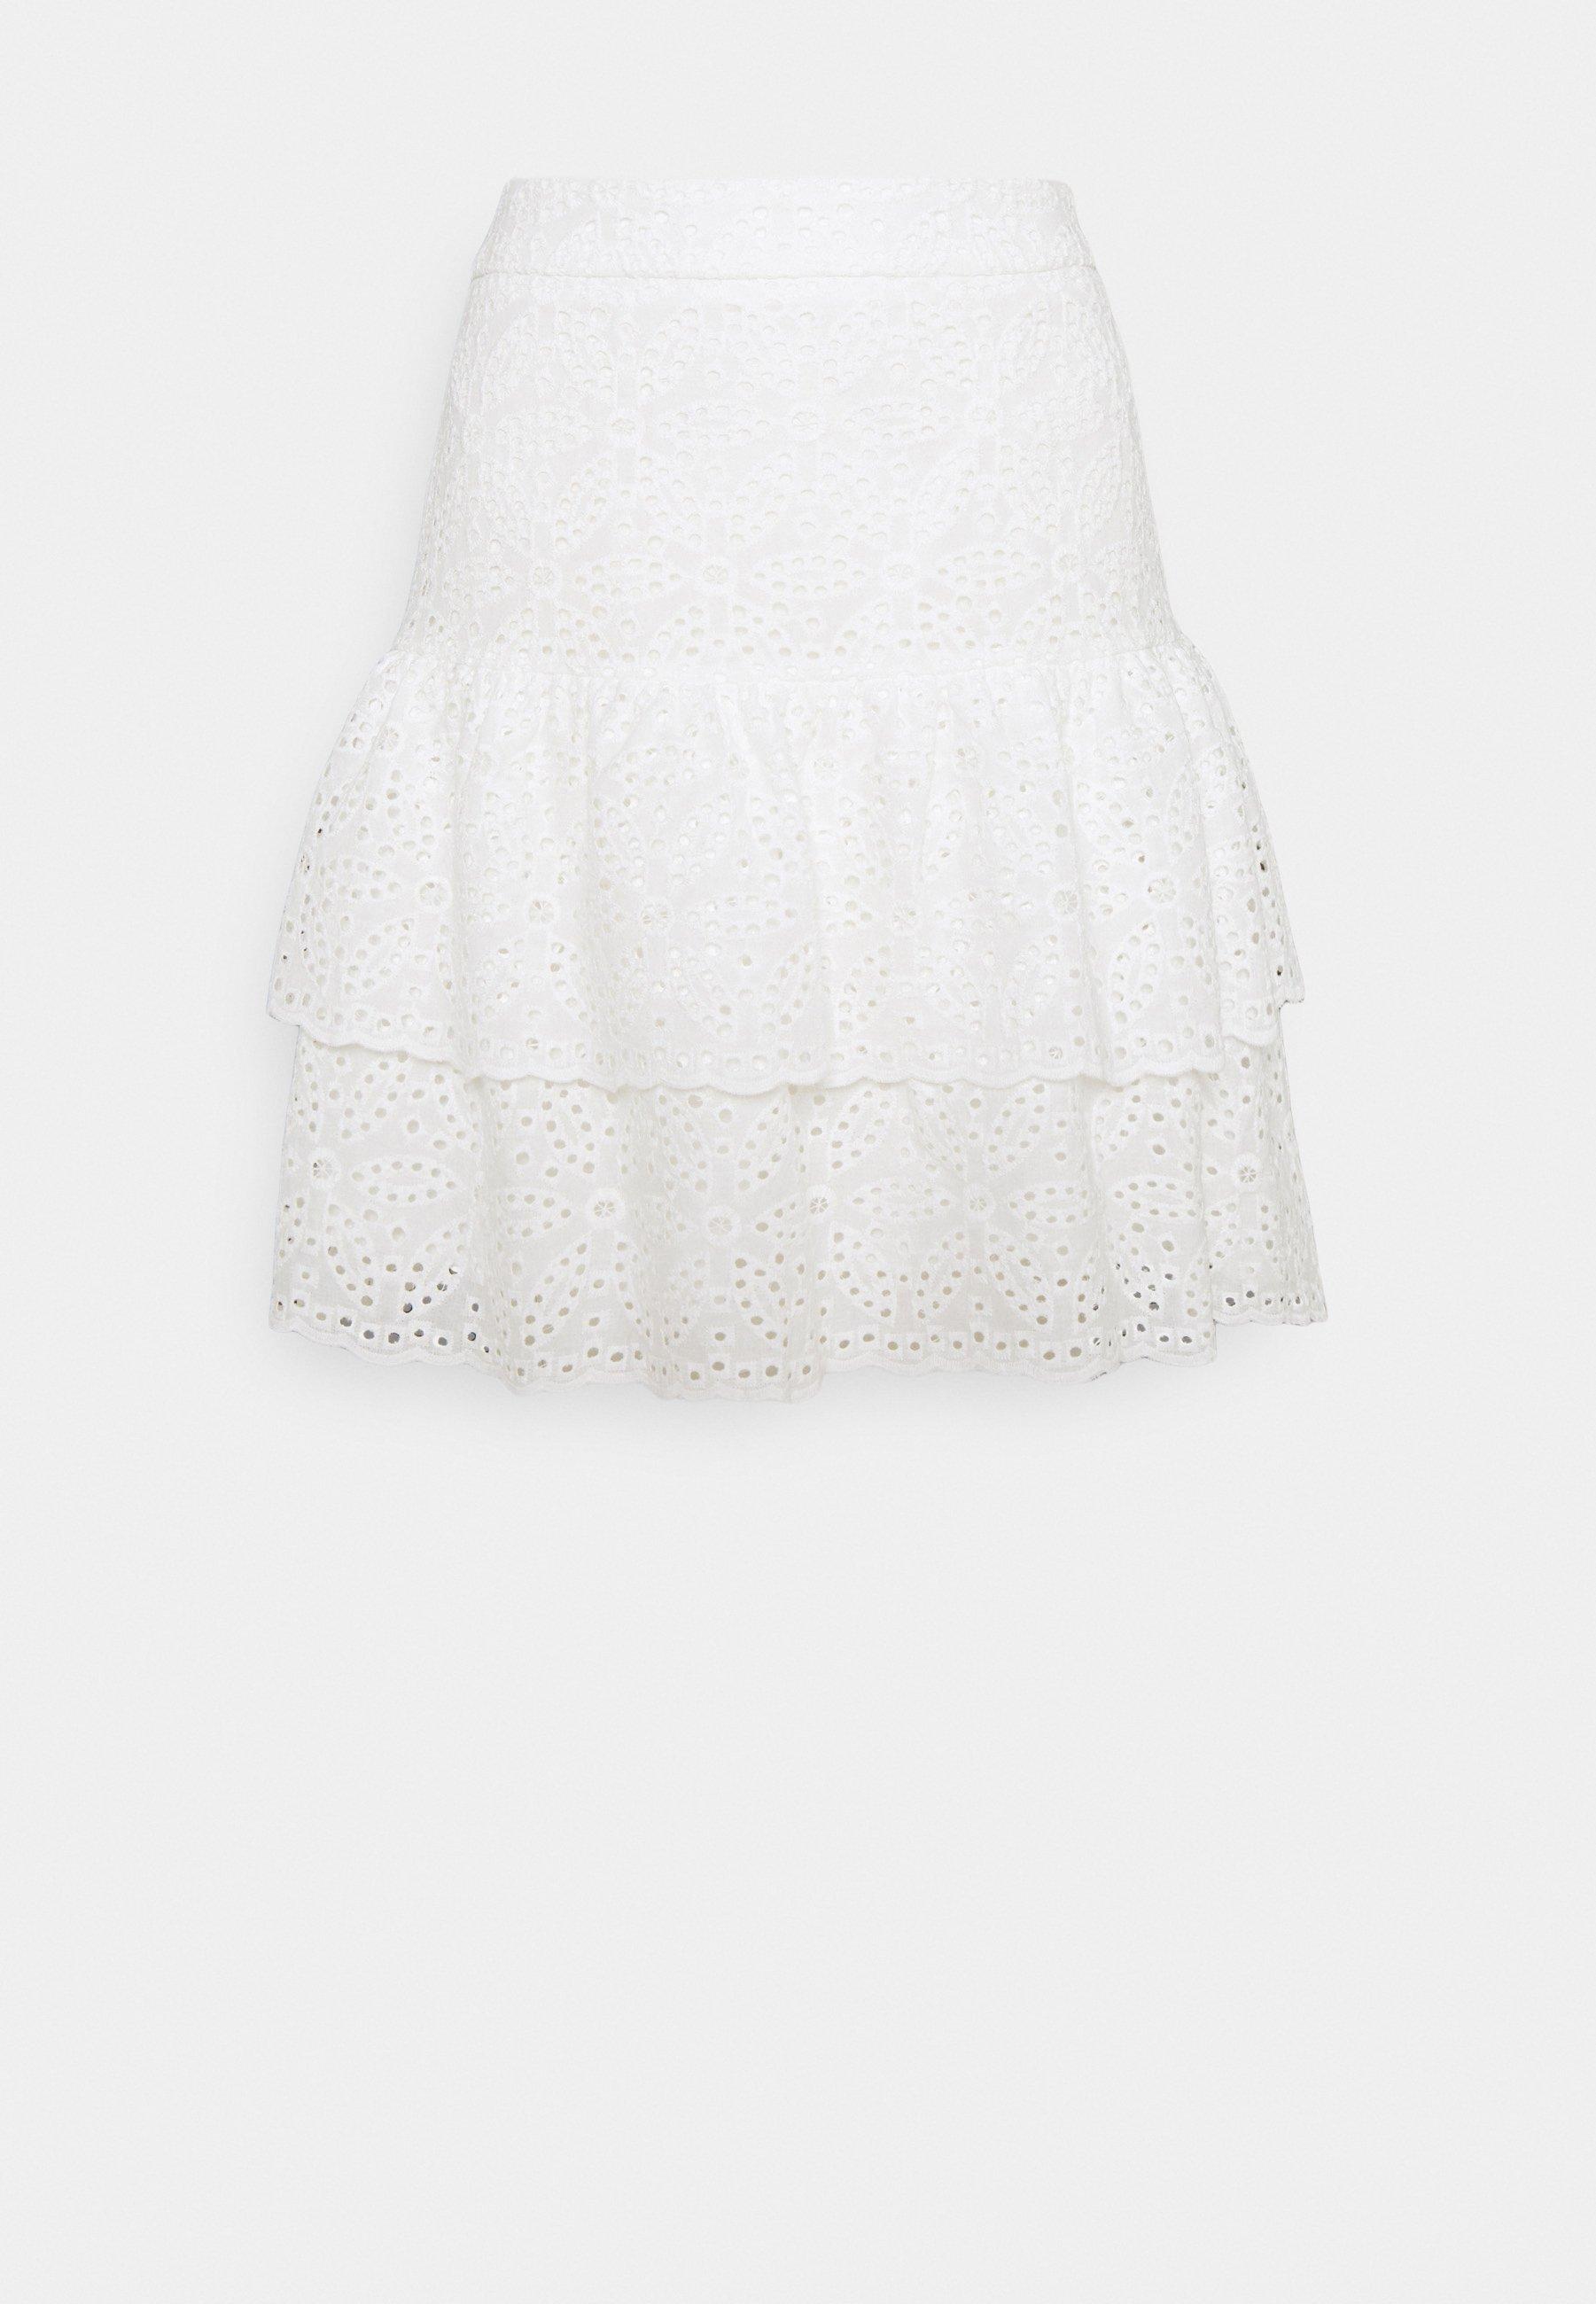 Femme KACEY SKIRT - Minijupe